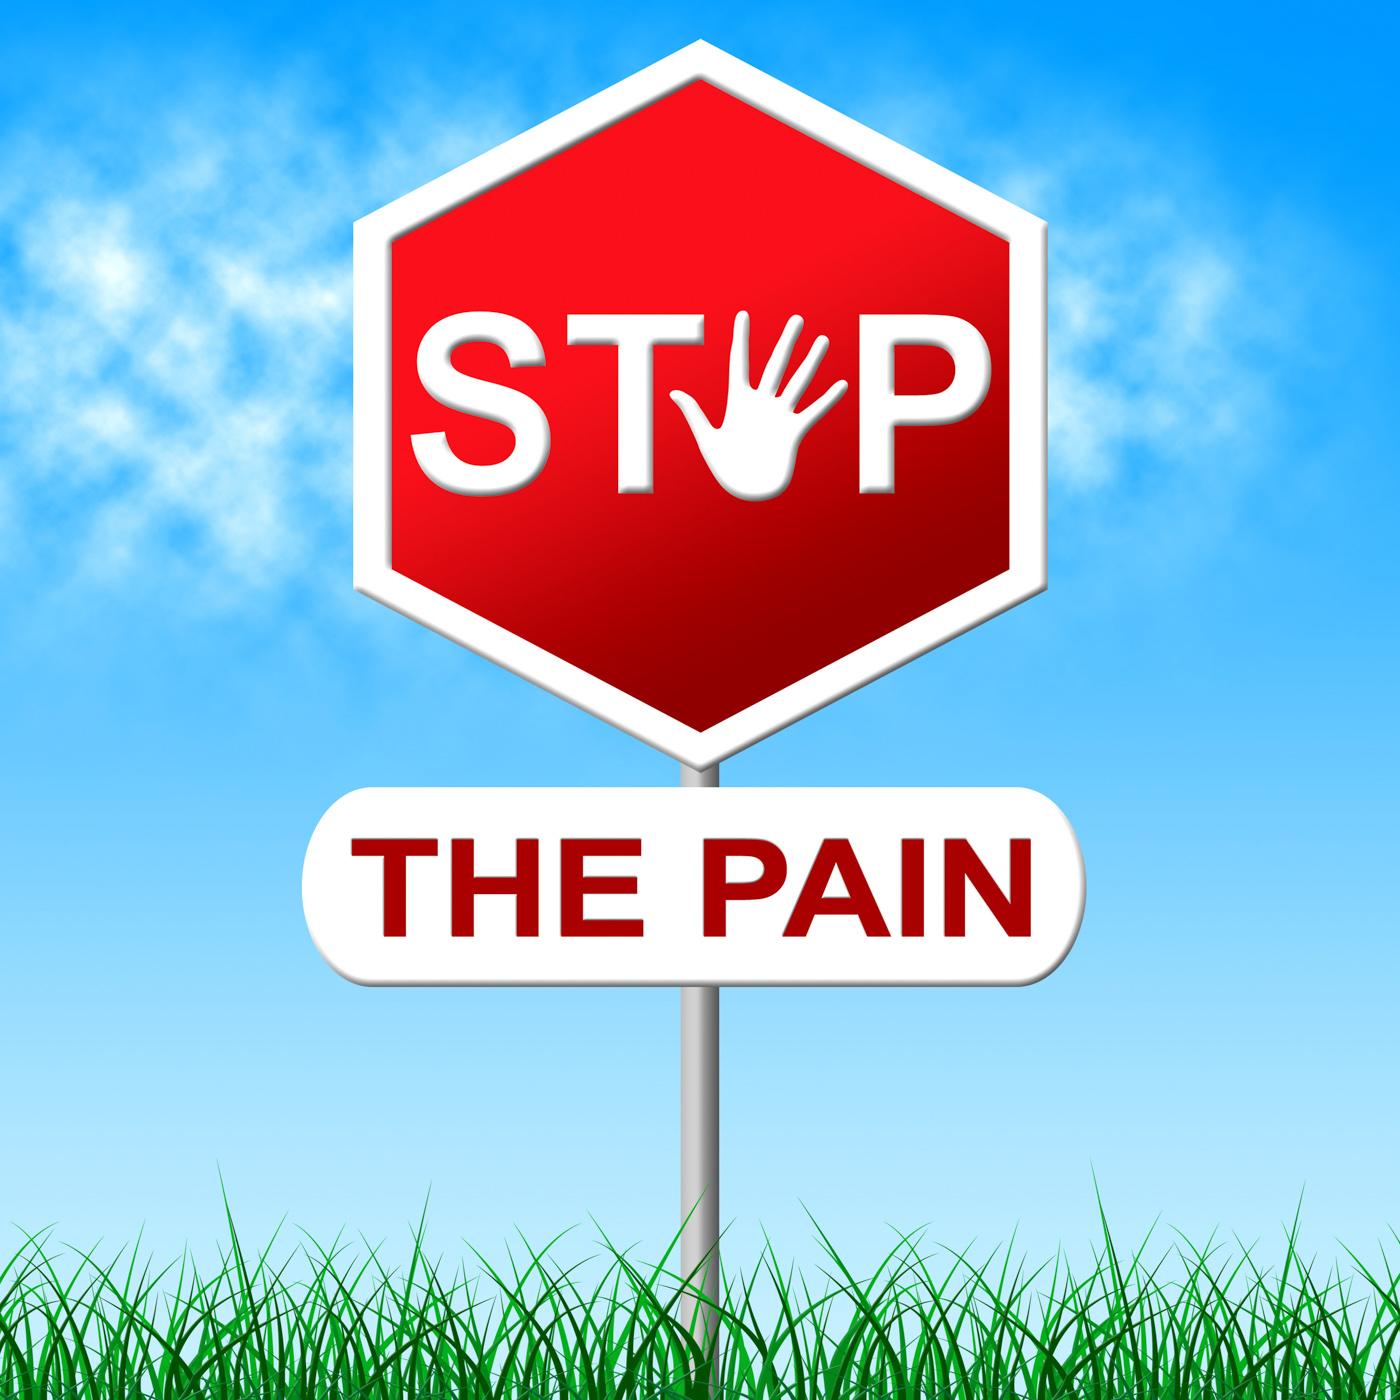 Stop Pain Means Torture Danger And Caution, Caution, Shootingpain, Warning, Torture, HQ Photo